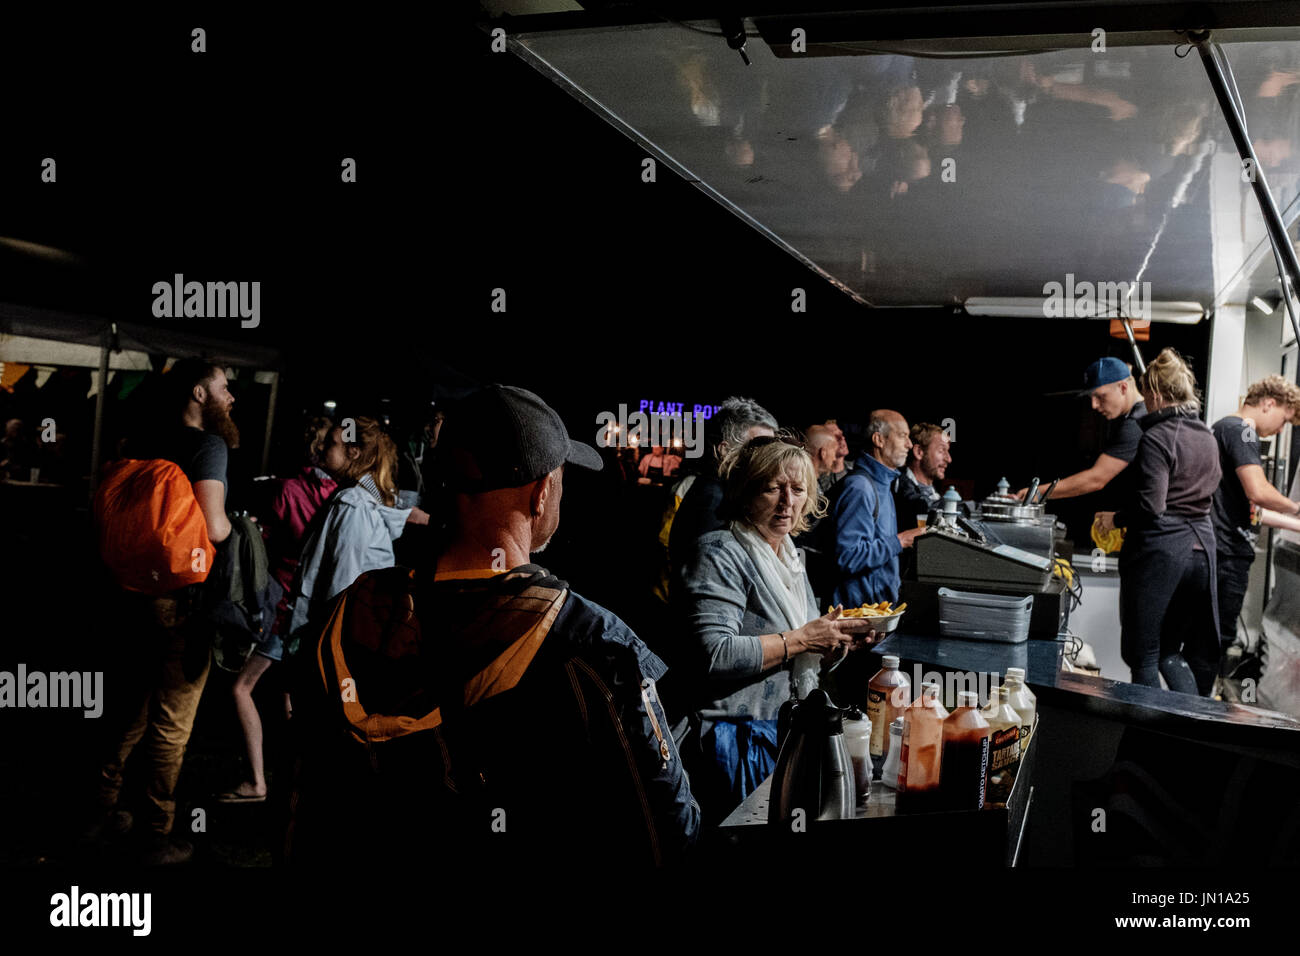 Cambridge, UK. 28th July, 2017  Festival goers grab late night snacks Richard Etteridge / Alamy Live News Stock Photo